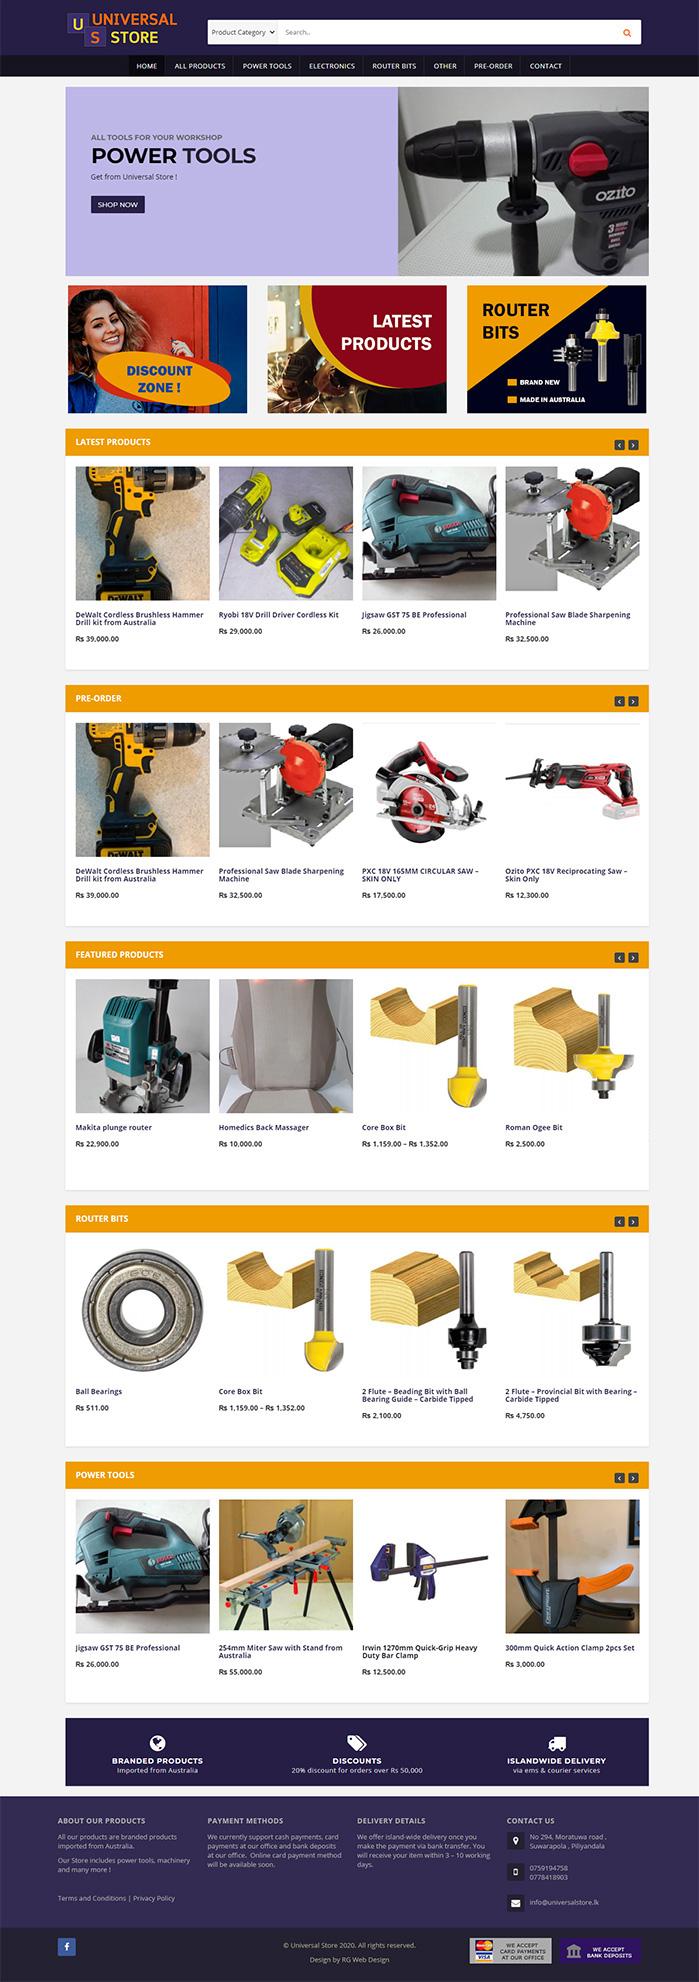 universalstore-website-store-by-rg-webdesign-sri-lanka